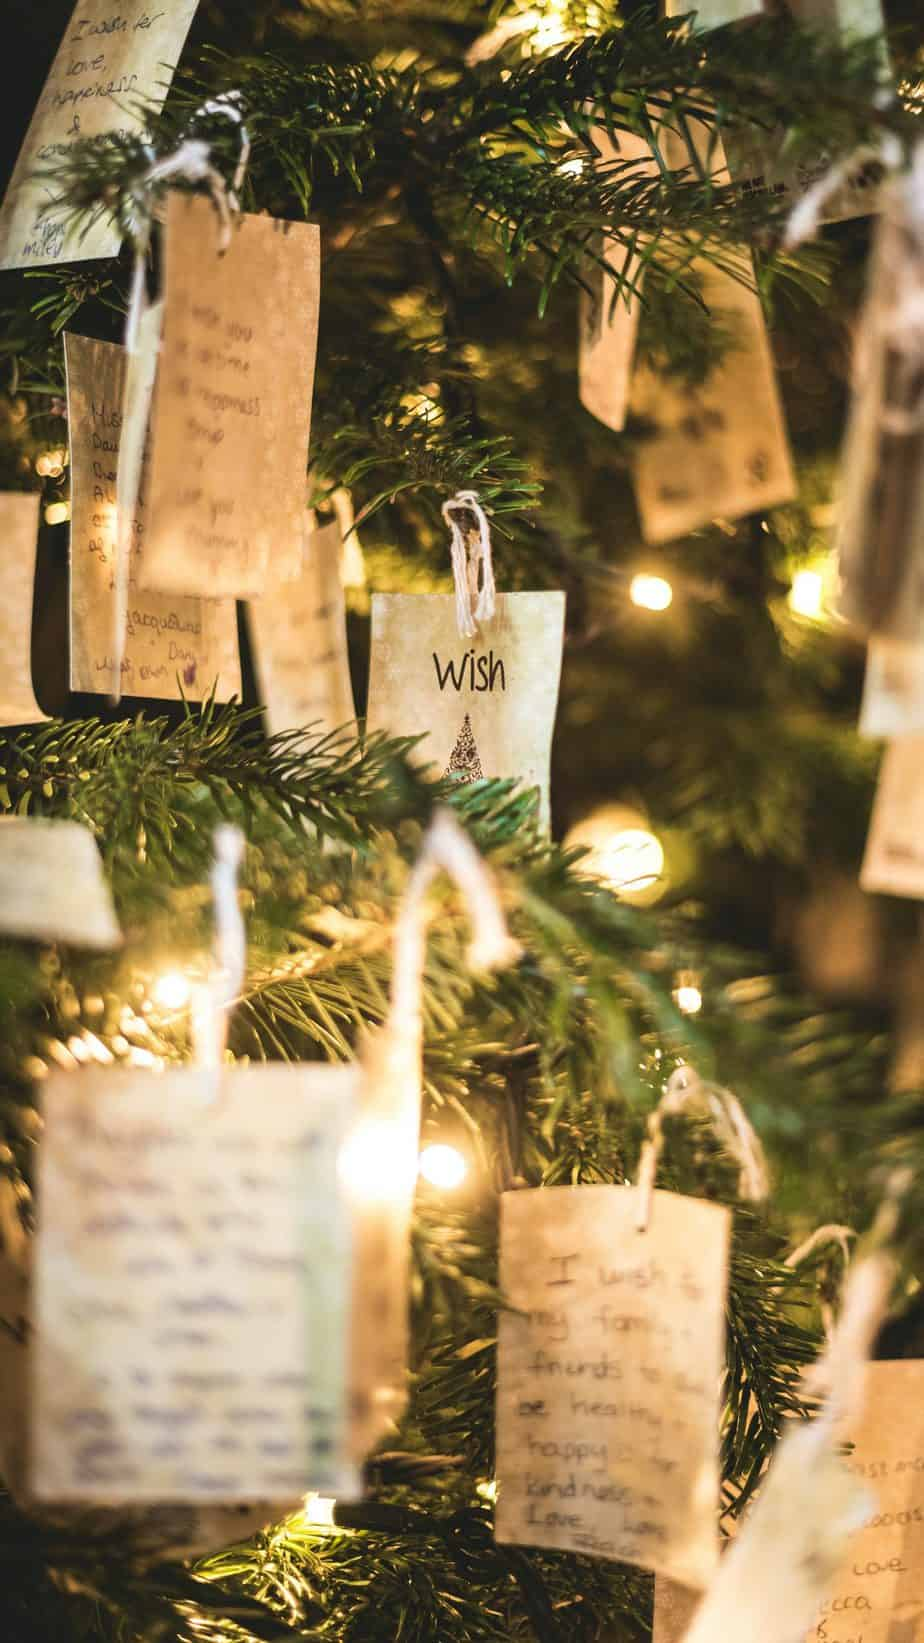 Preparing to visit family near Christmas